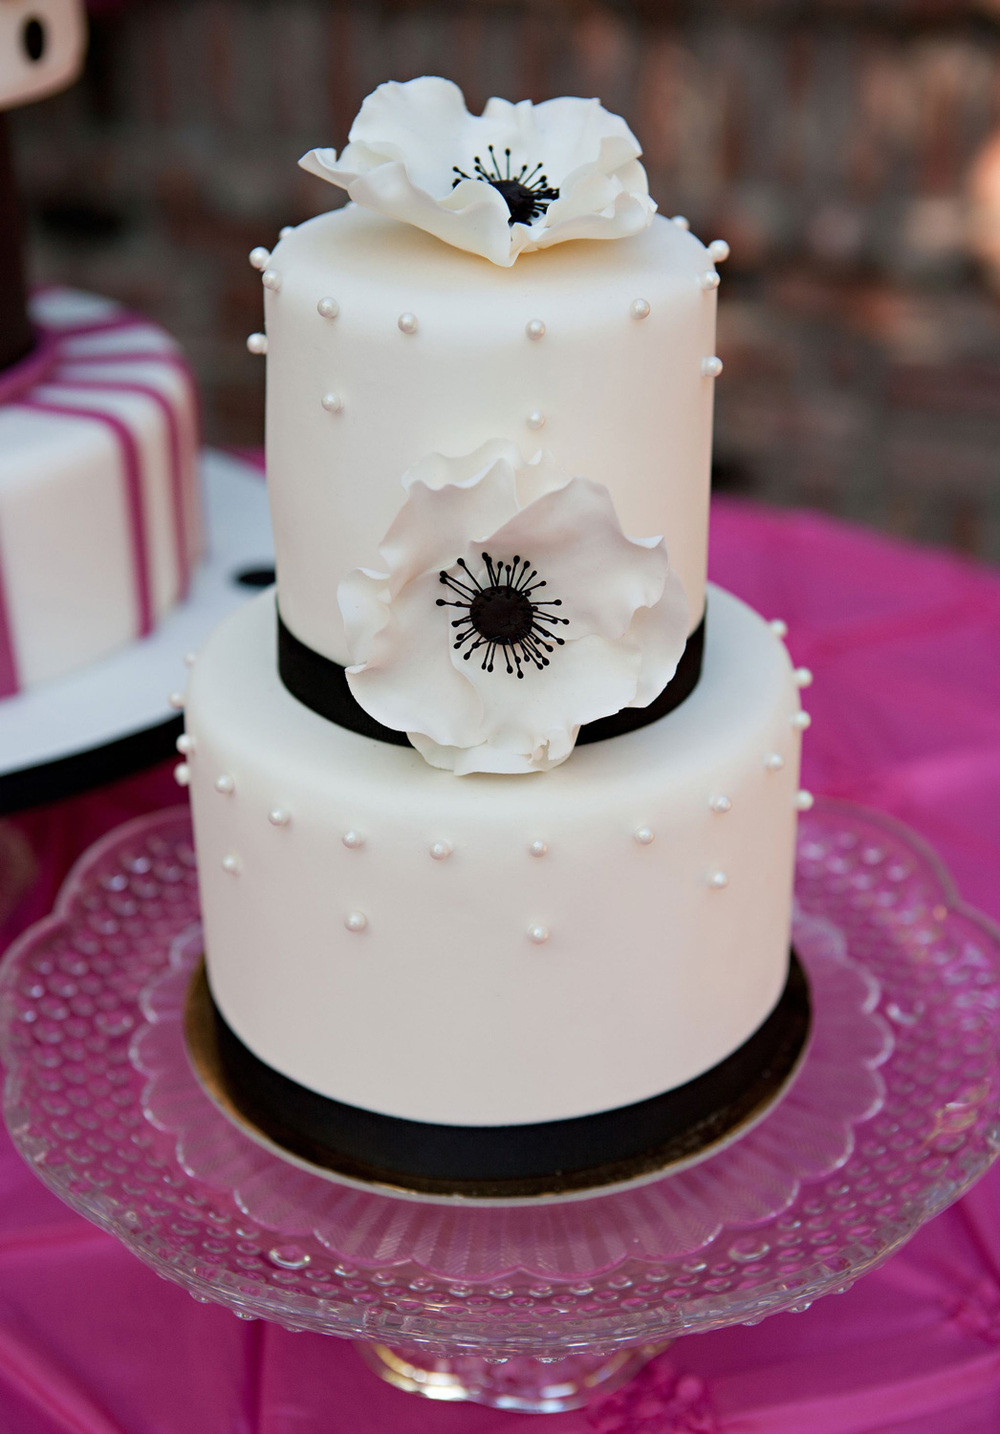 Mail Order Wedding Cakes  Fondant Wedding Cakes — Patisserie Angelica